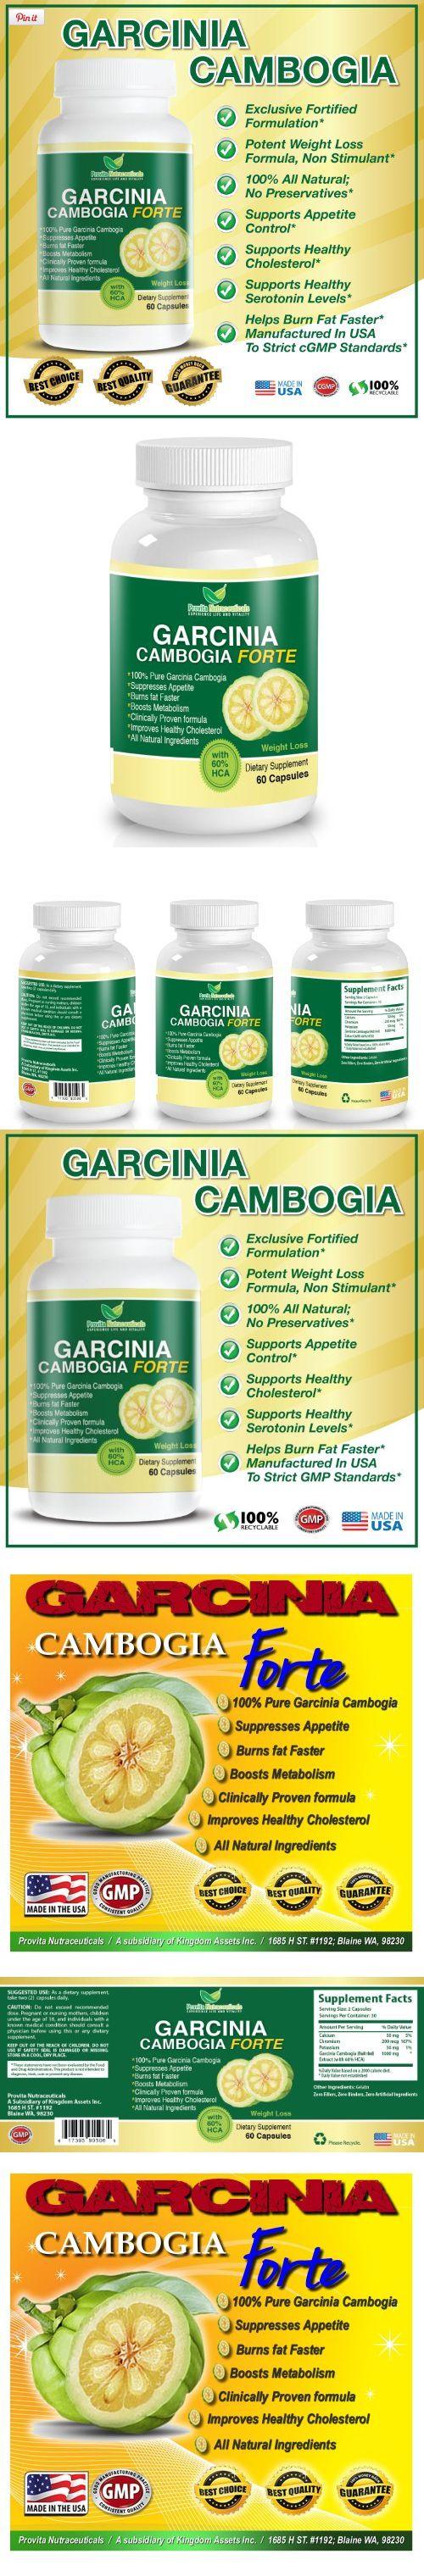 garcinia cambogia and prediabetes